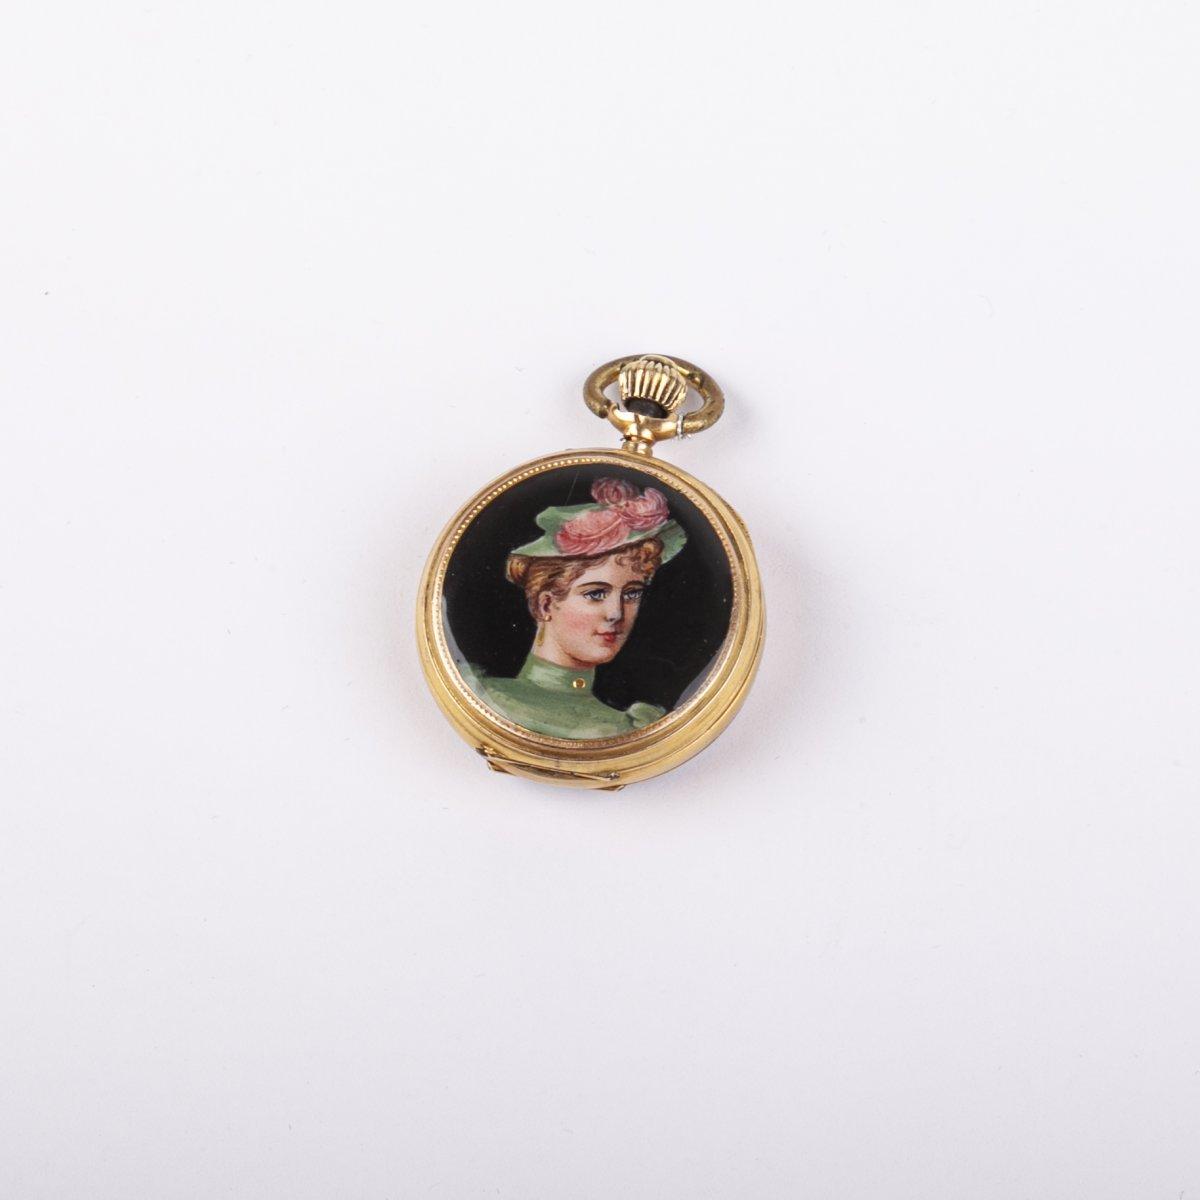 12k Gold Open Face Pocket Watch With Enamel